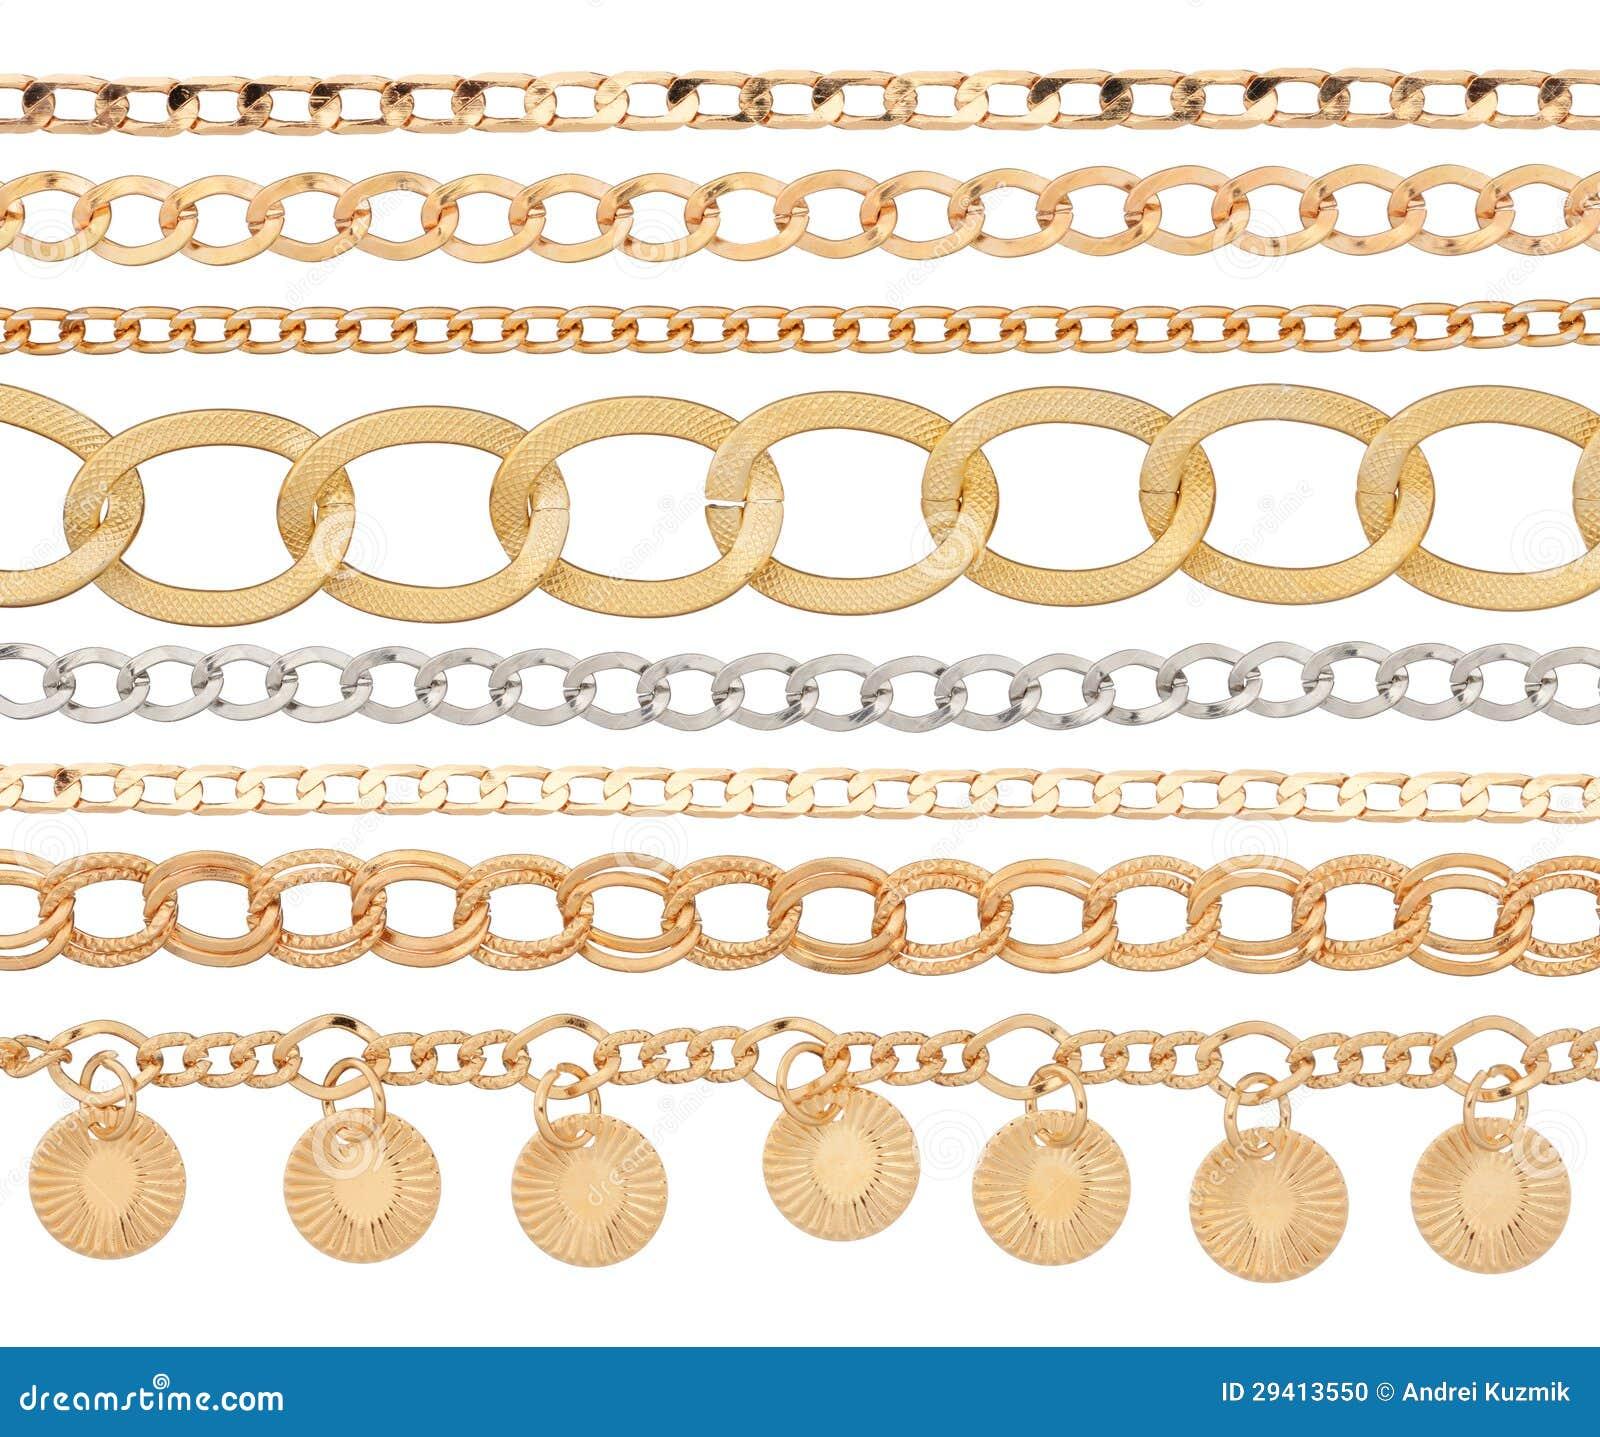 F stock options chain